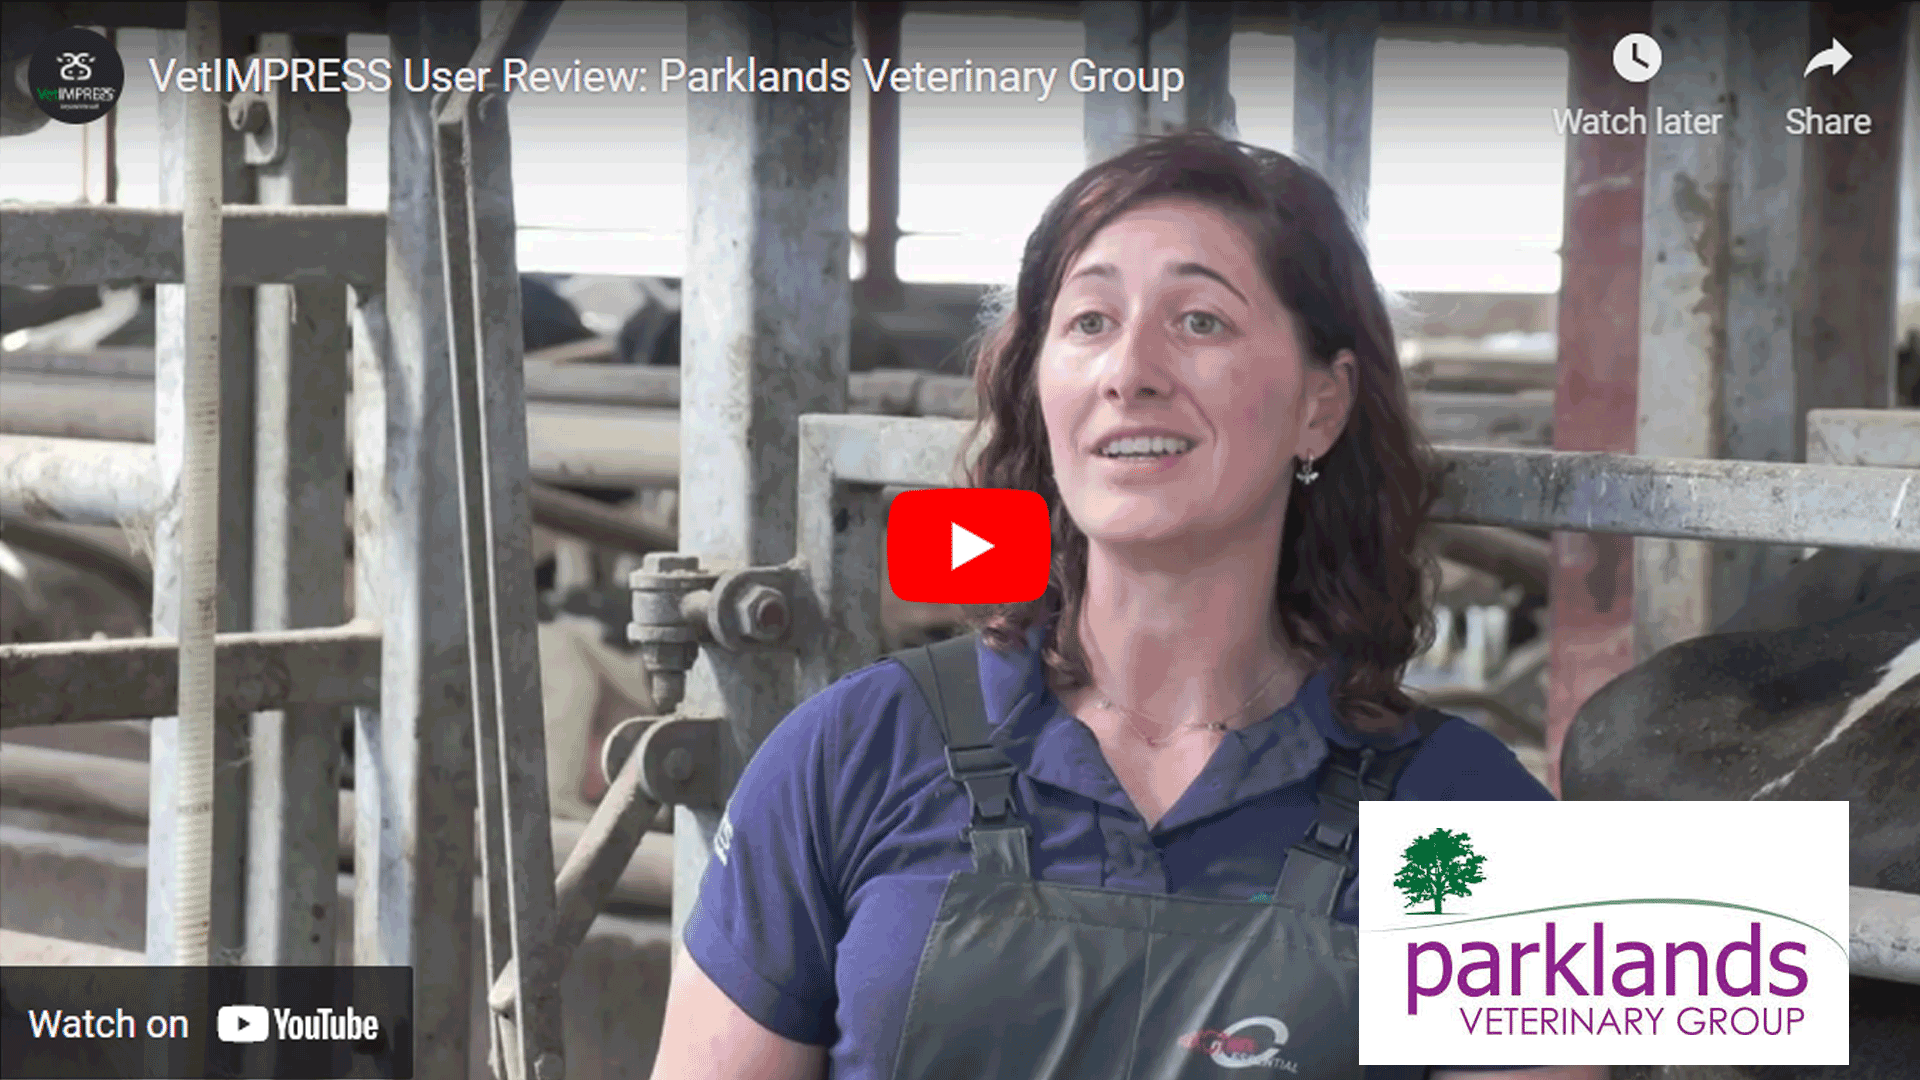 VetIMPRESS Review: Parklands Veterinary Group